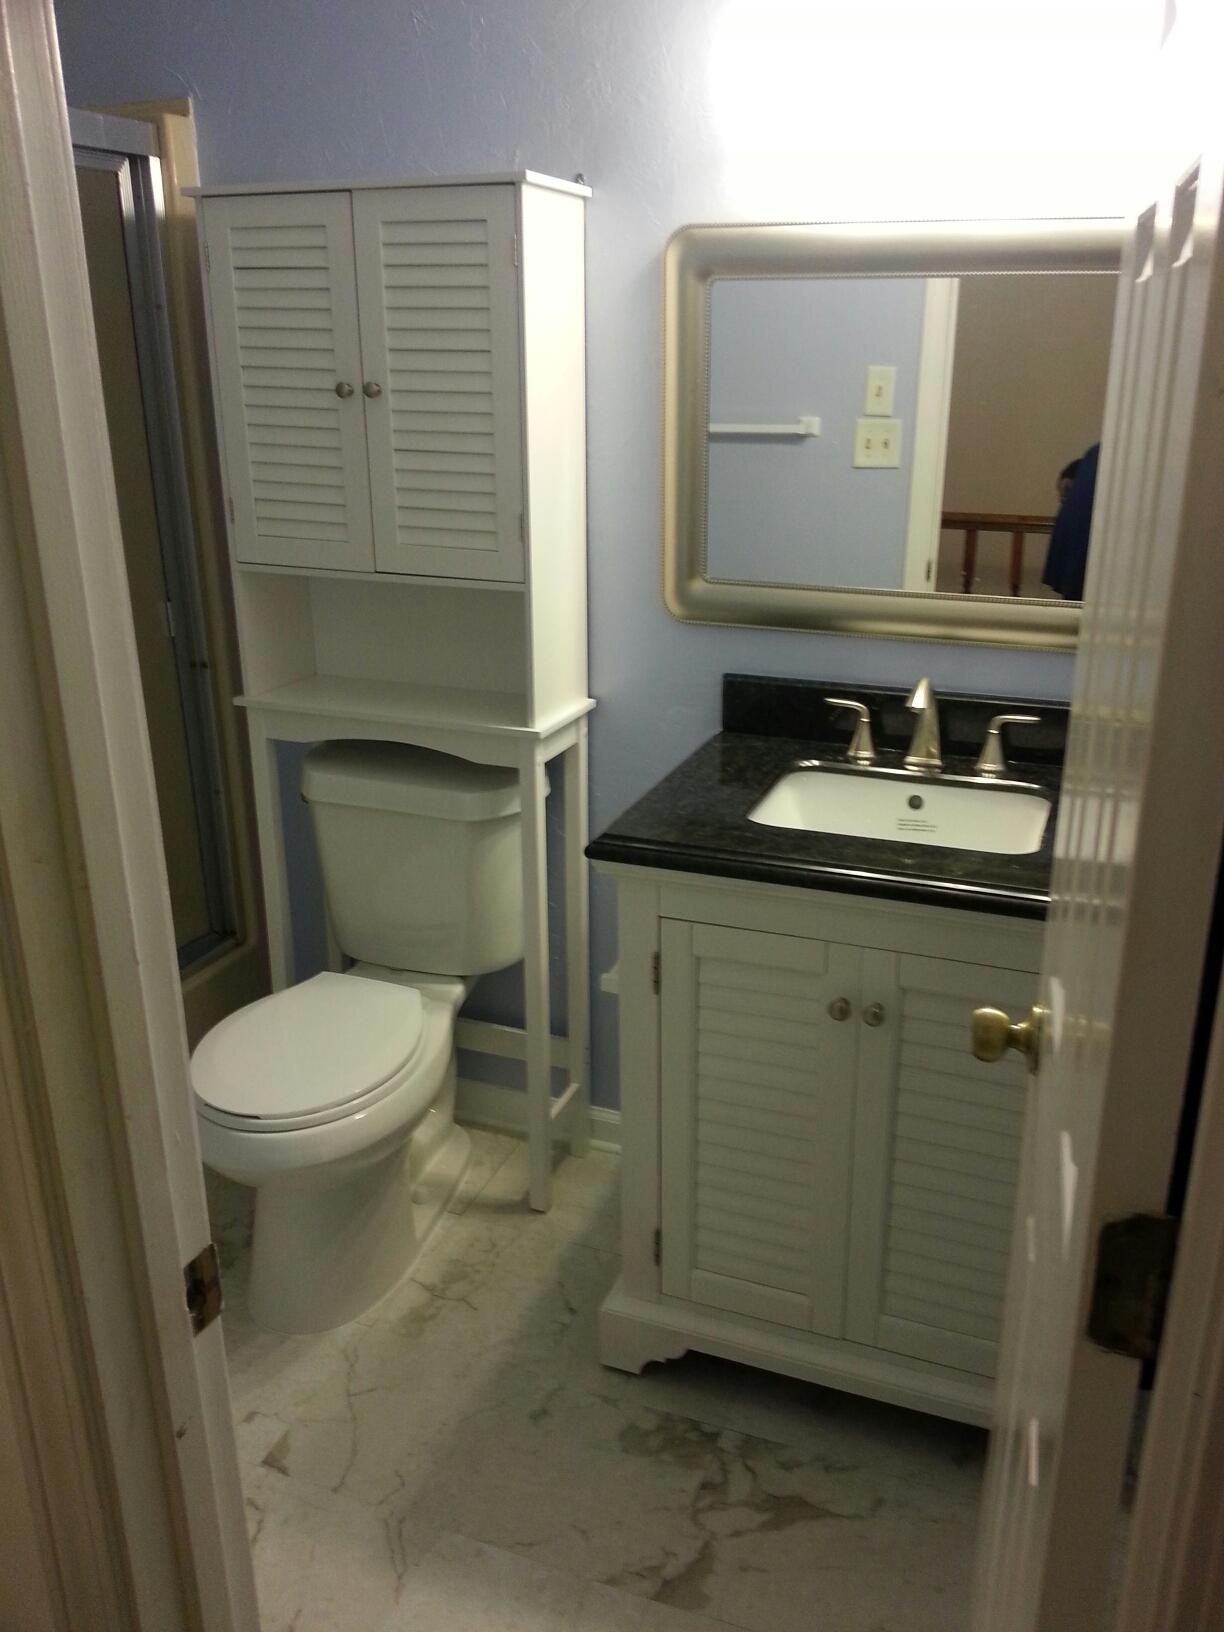 Doraville, GA - Bathroom remodel.